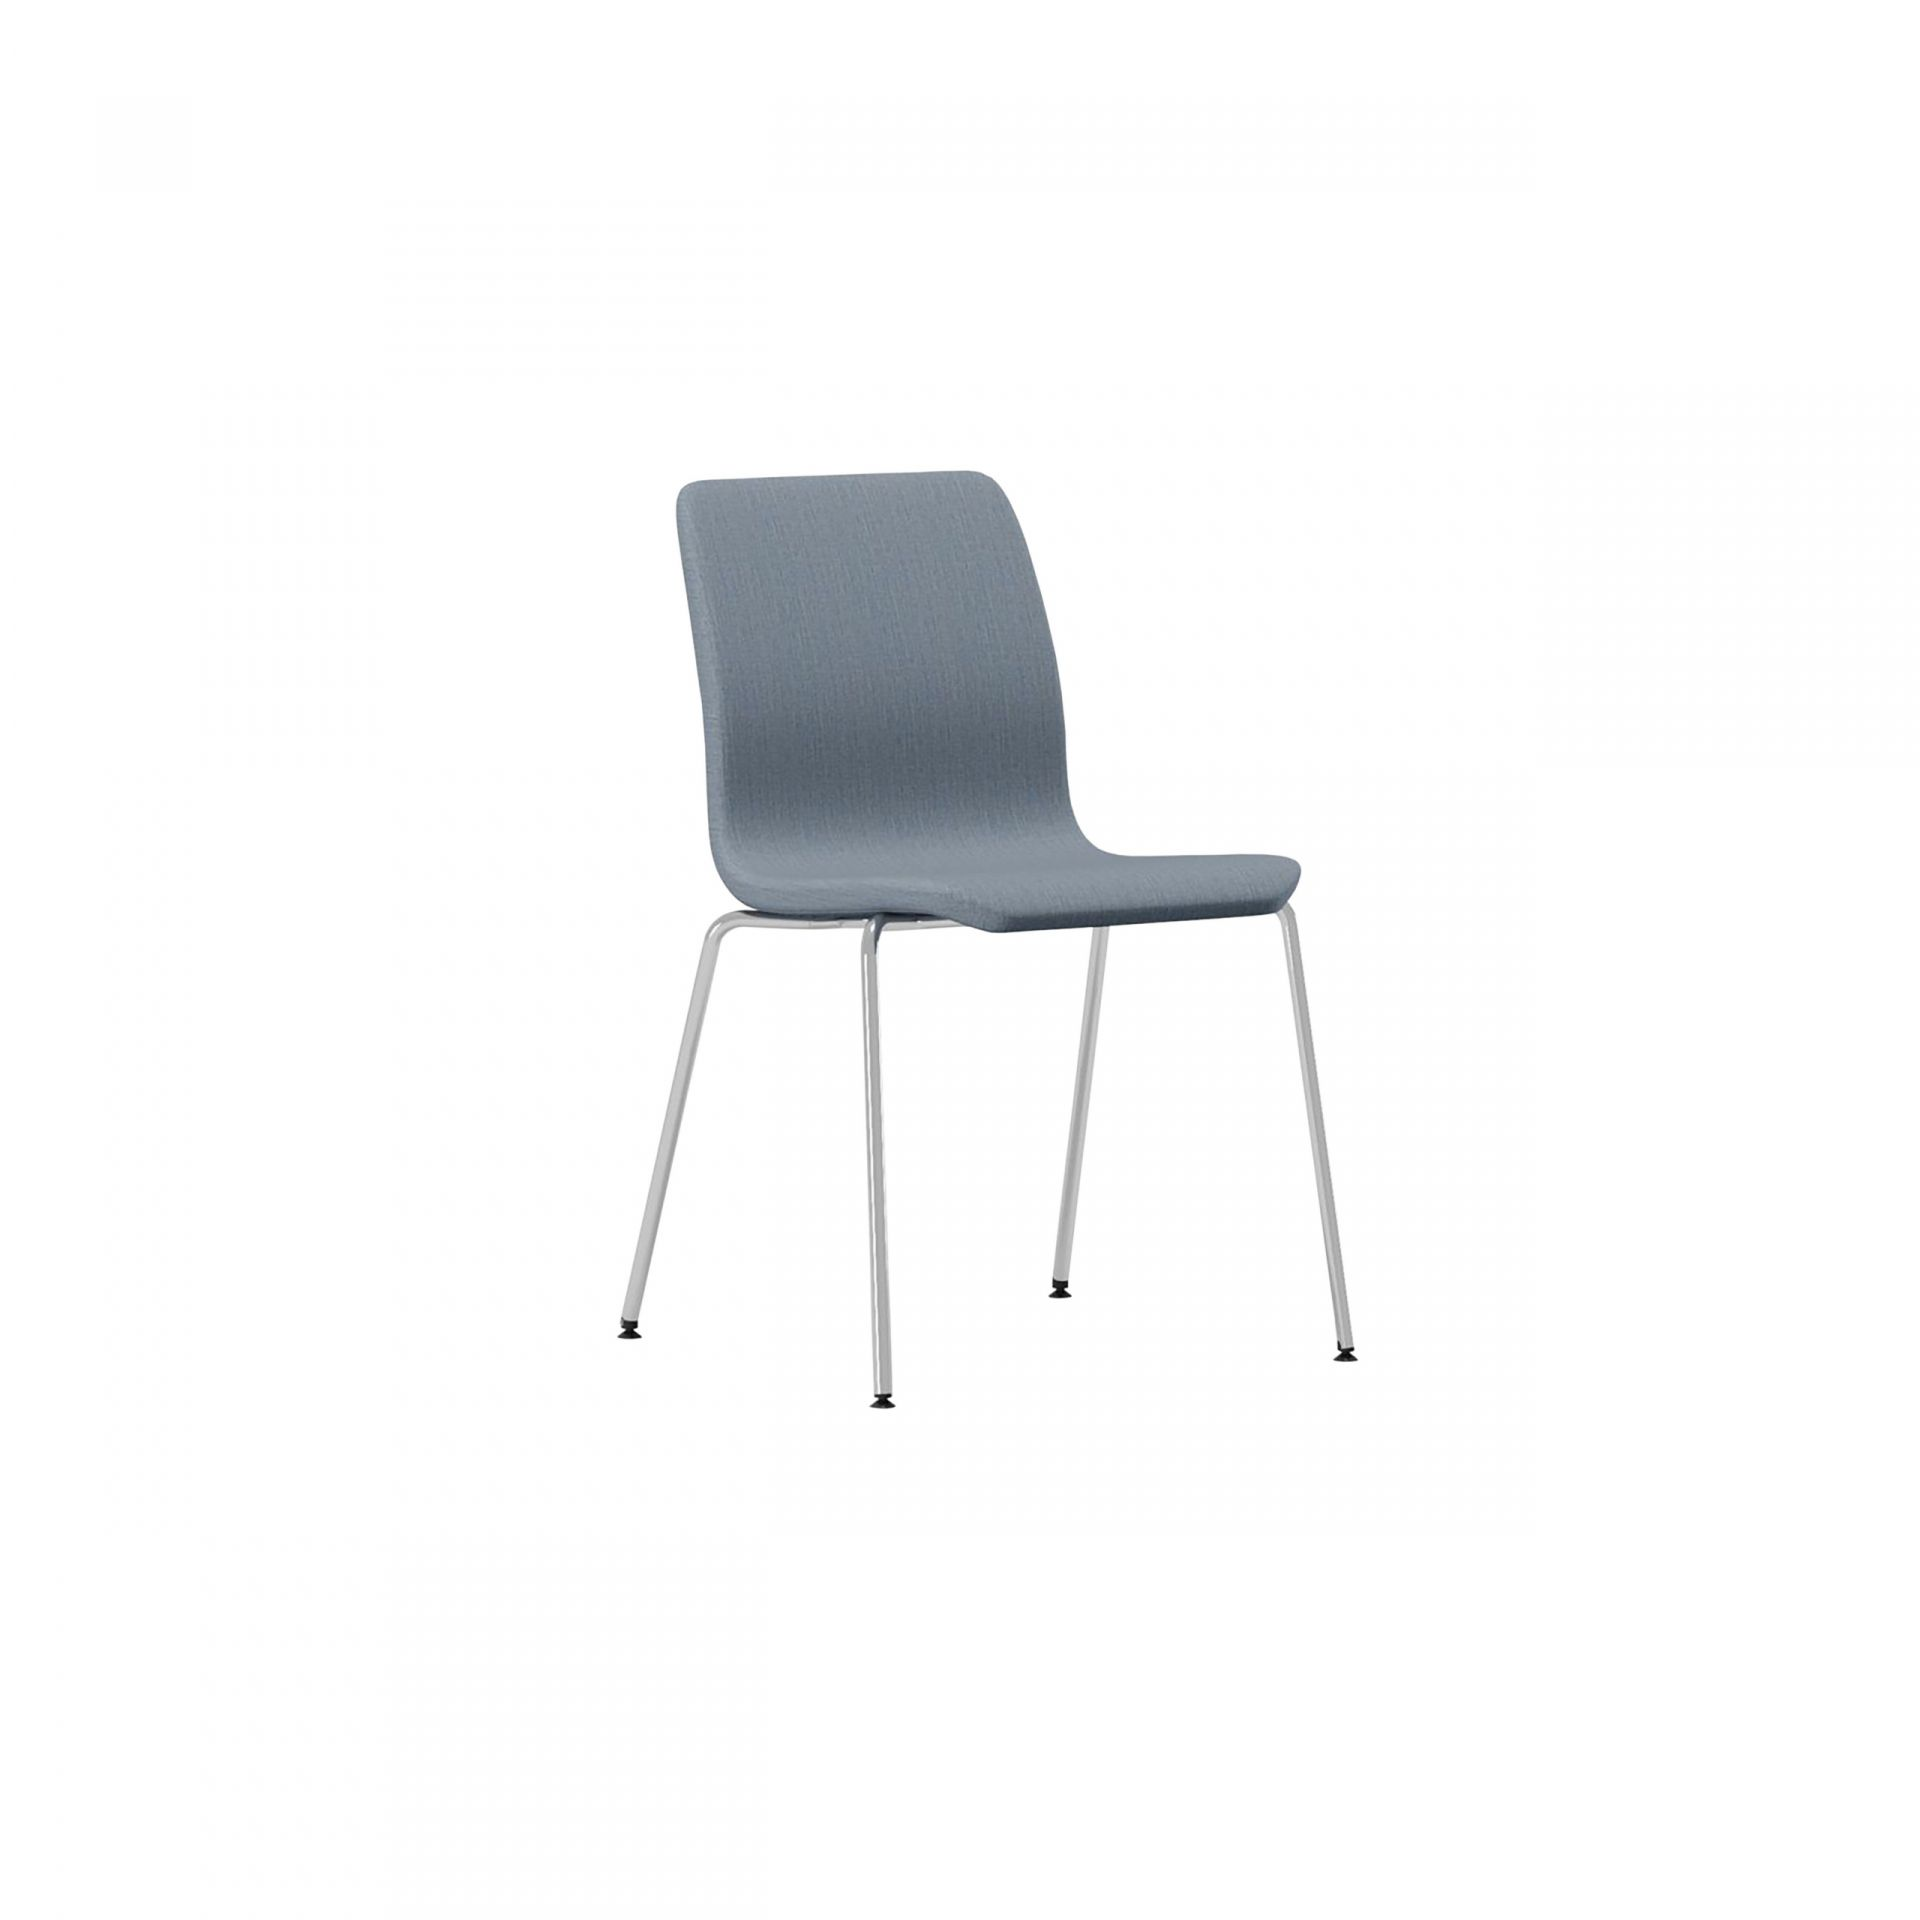 Nova Chair with metal legs